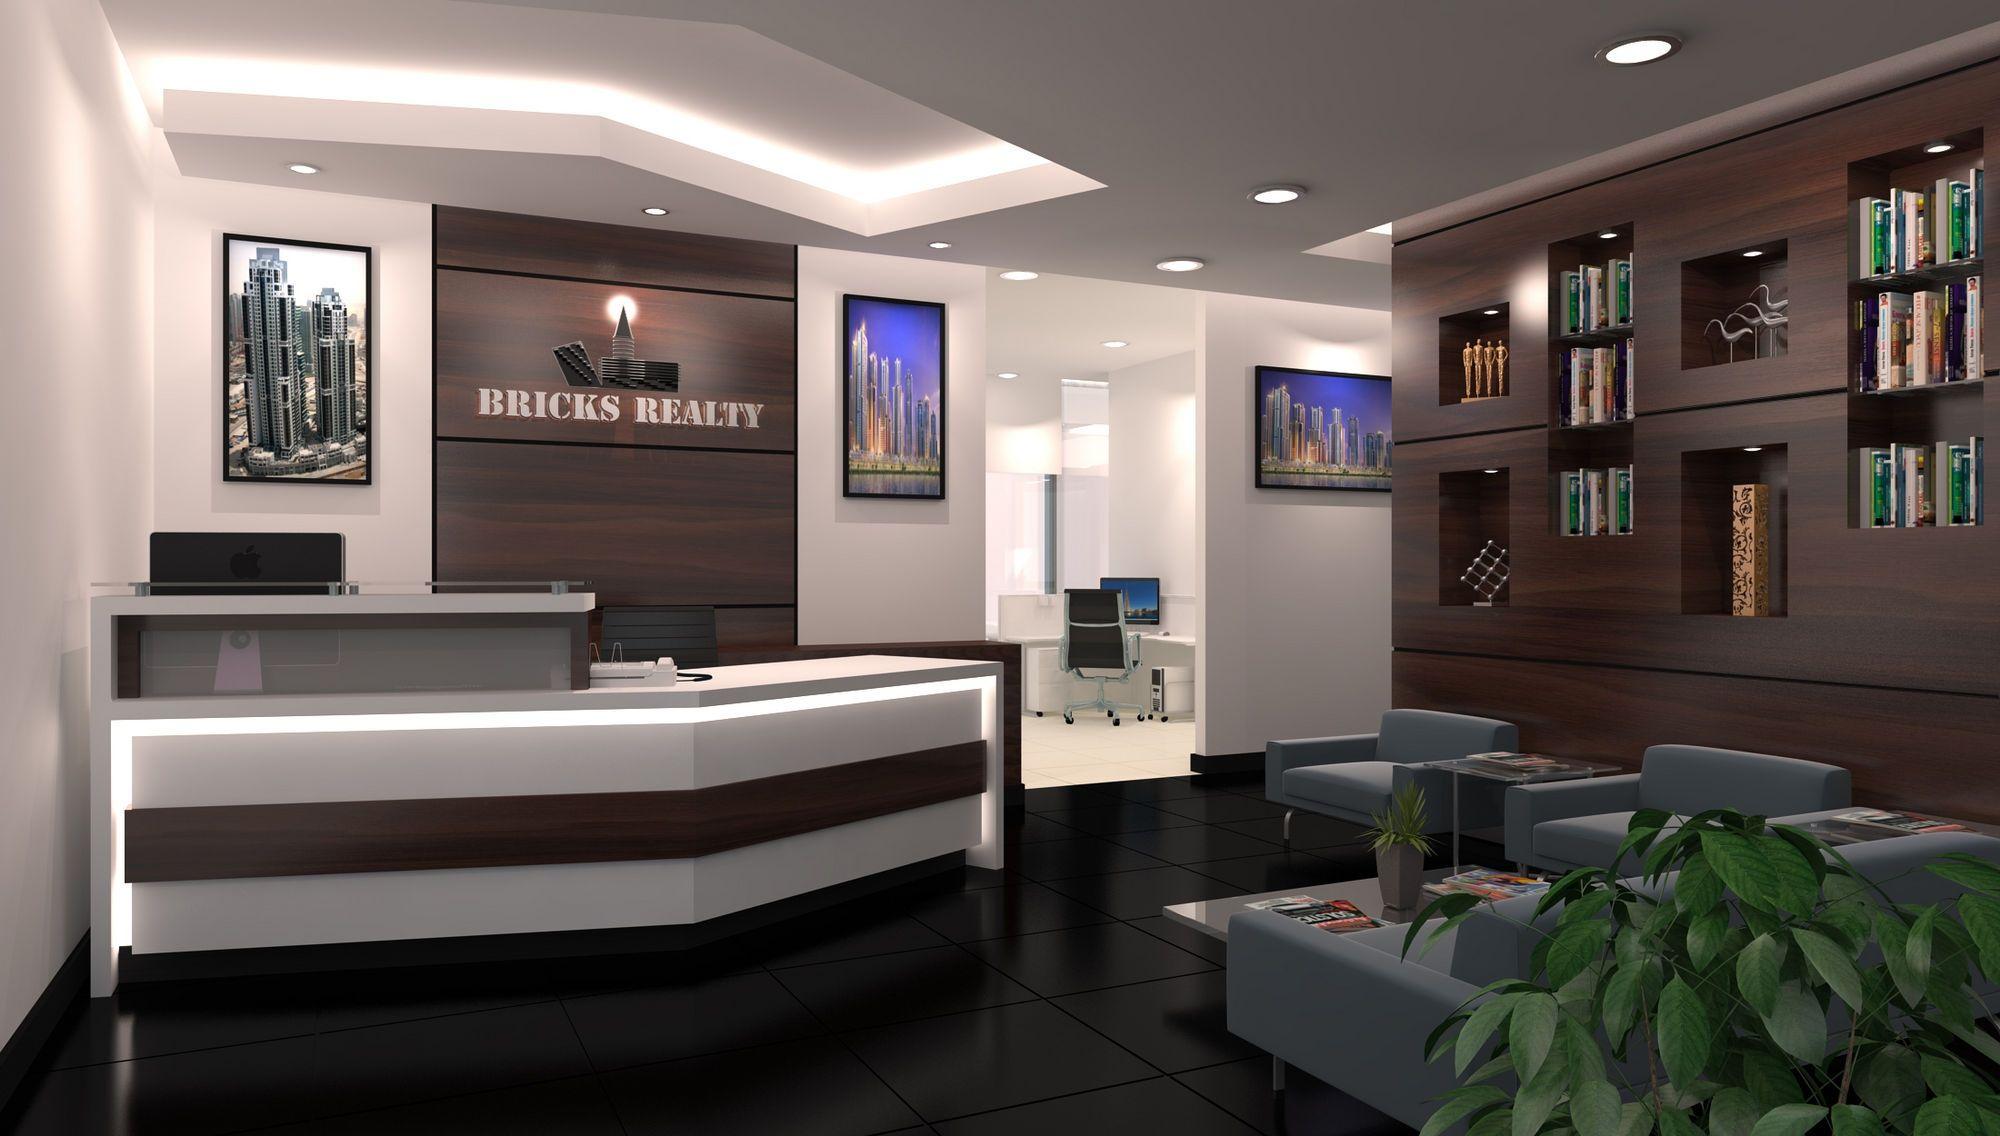 Image Result For Nautical Reception Desk Modern Office Reception